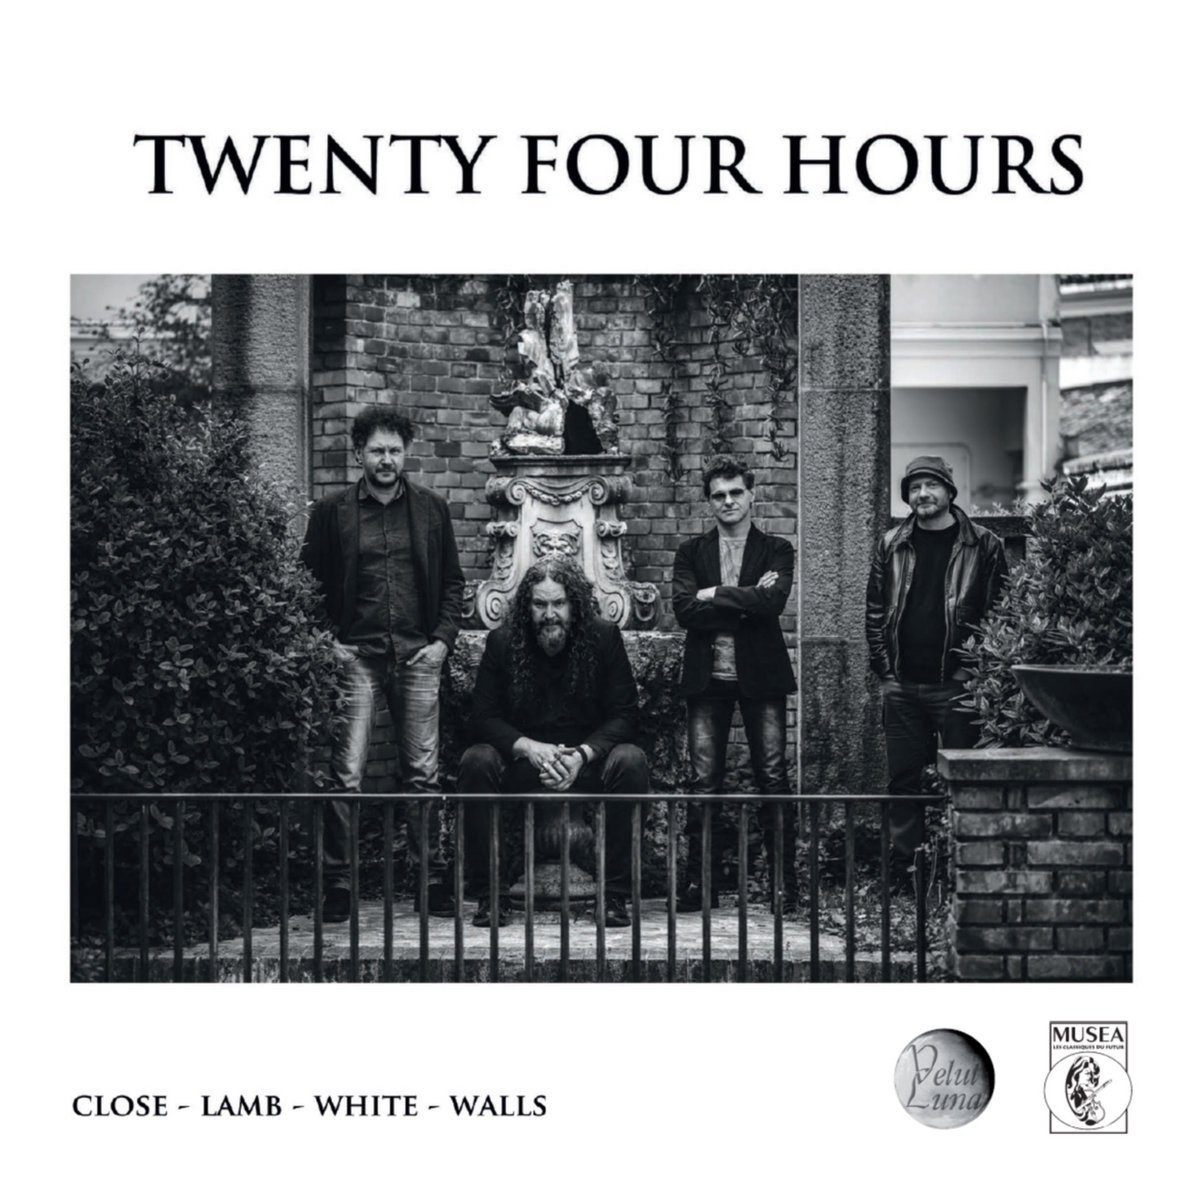 CLOSE - LAMB - WHITE - WALLS (Double Album) Master 88KHz/24